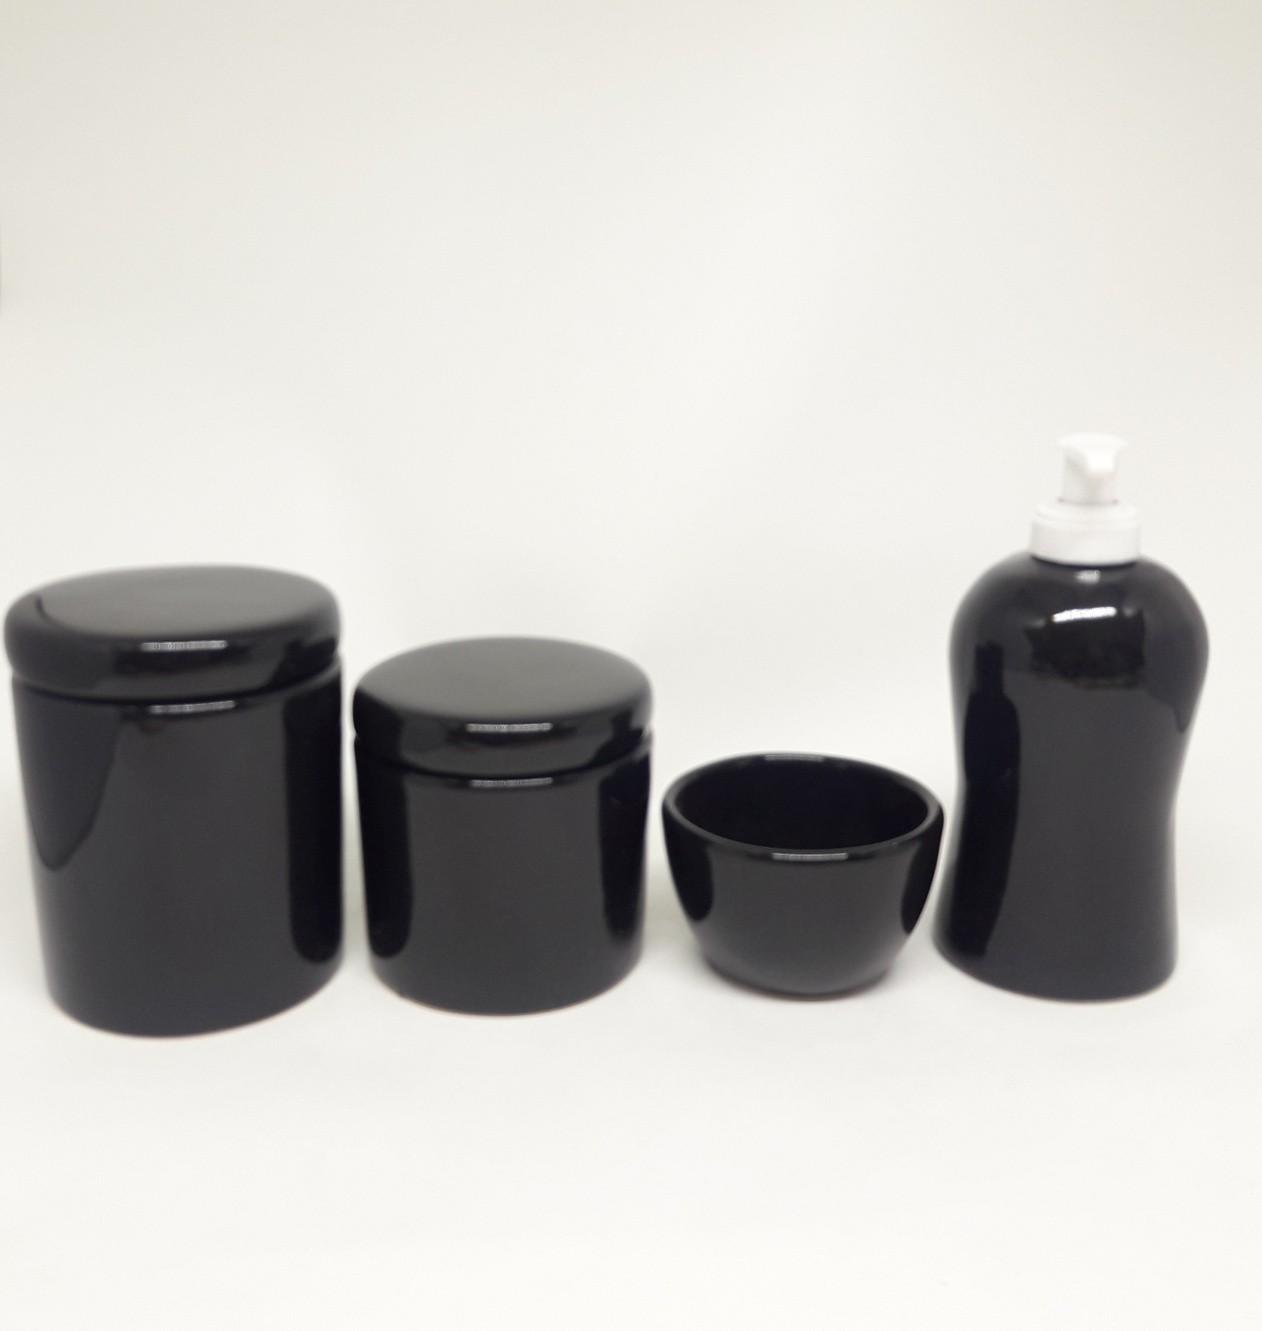 Kit Higiene Bebê Cerâmica Preto 4 peças